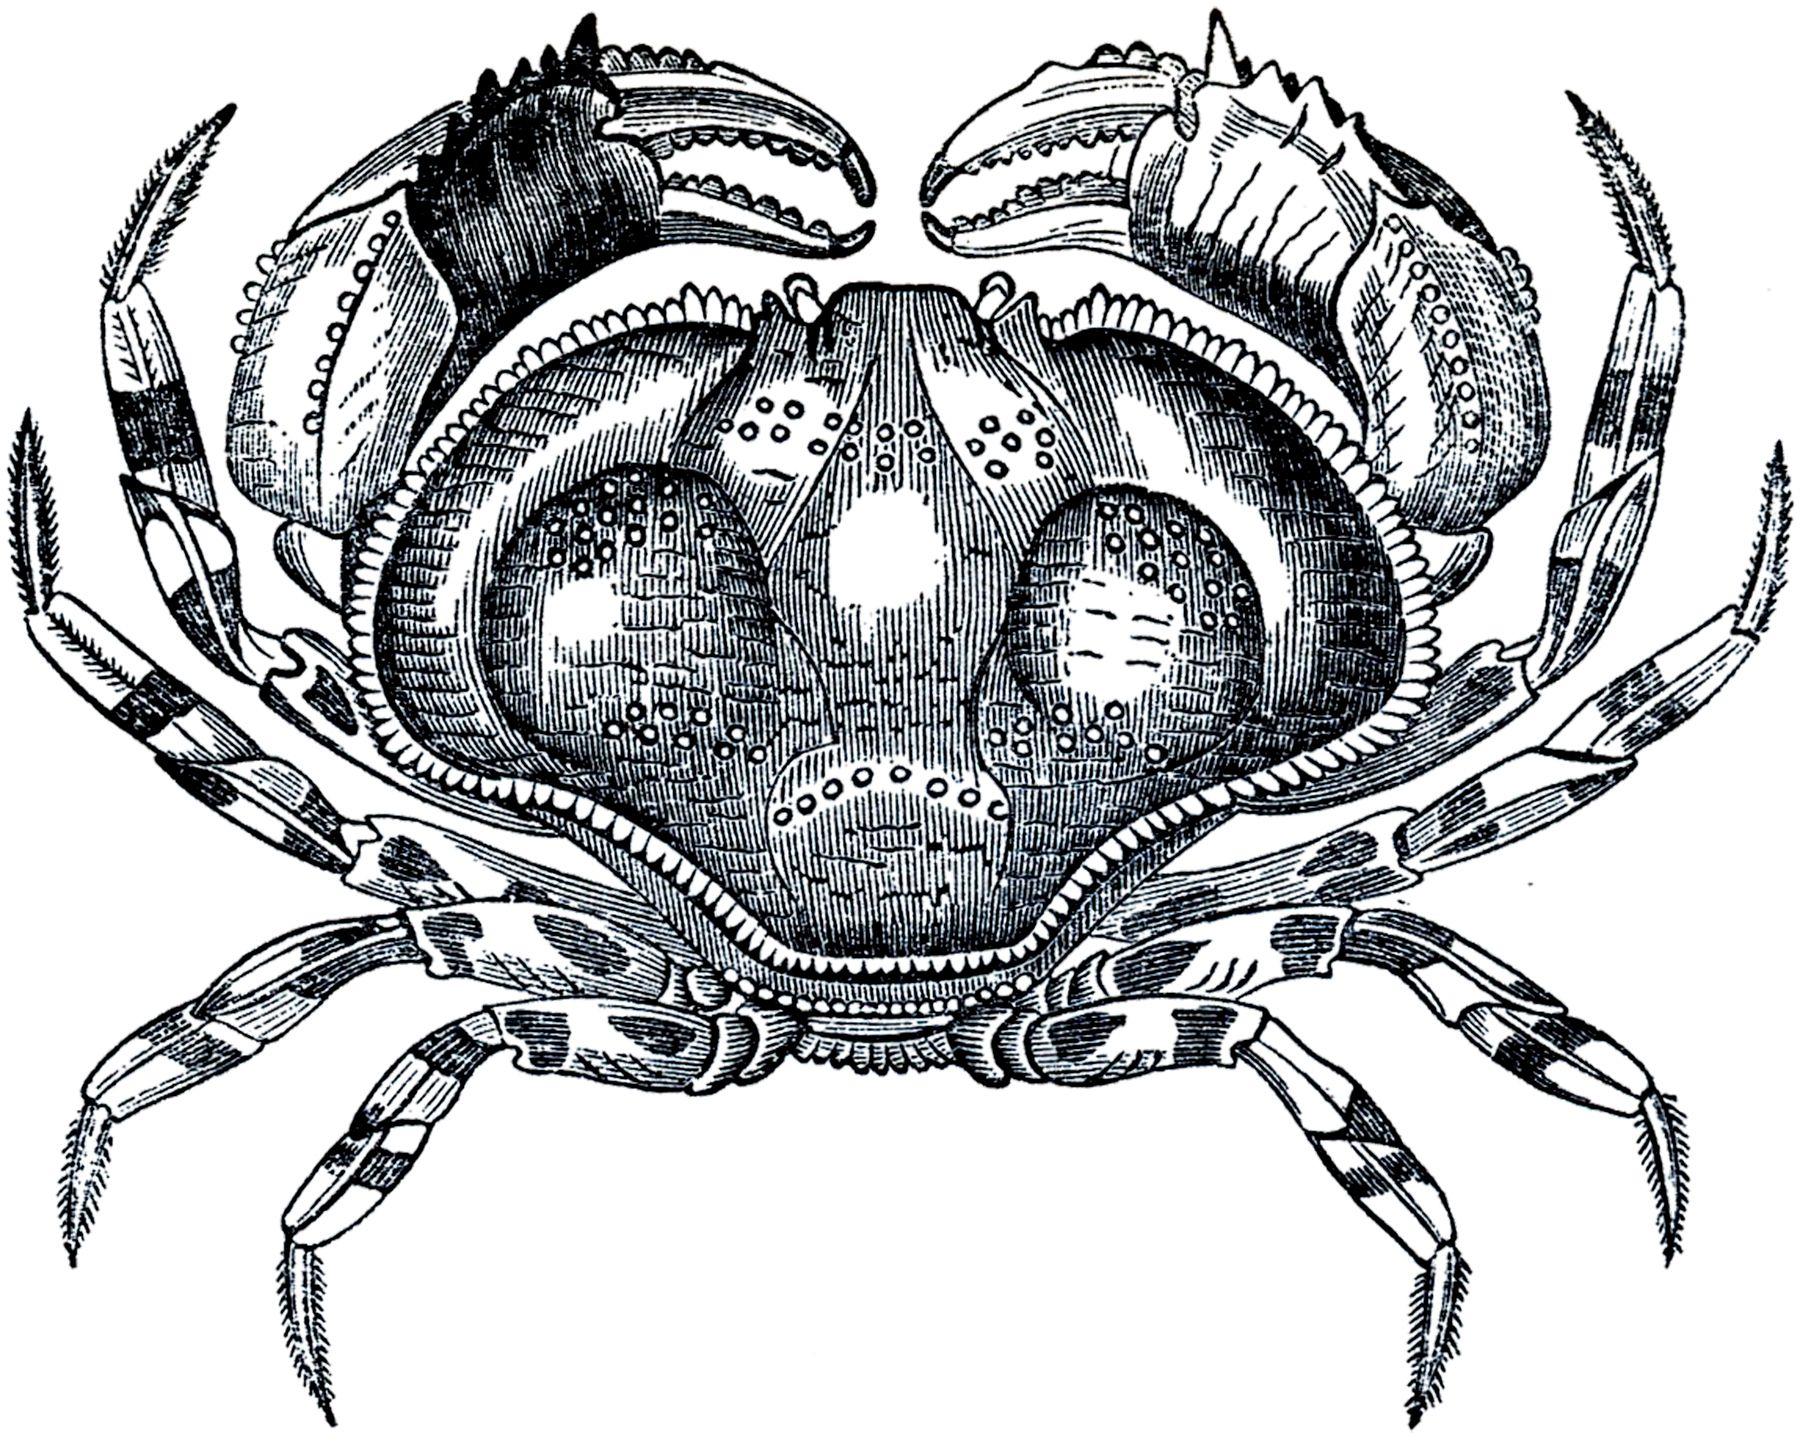 50+nautical+images+the+graphic+fairy | Free Public Domain Crab Image!